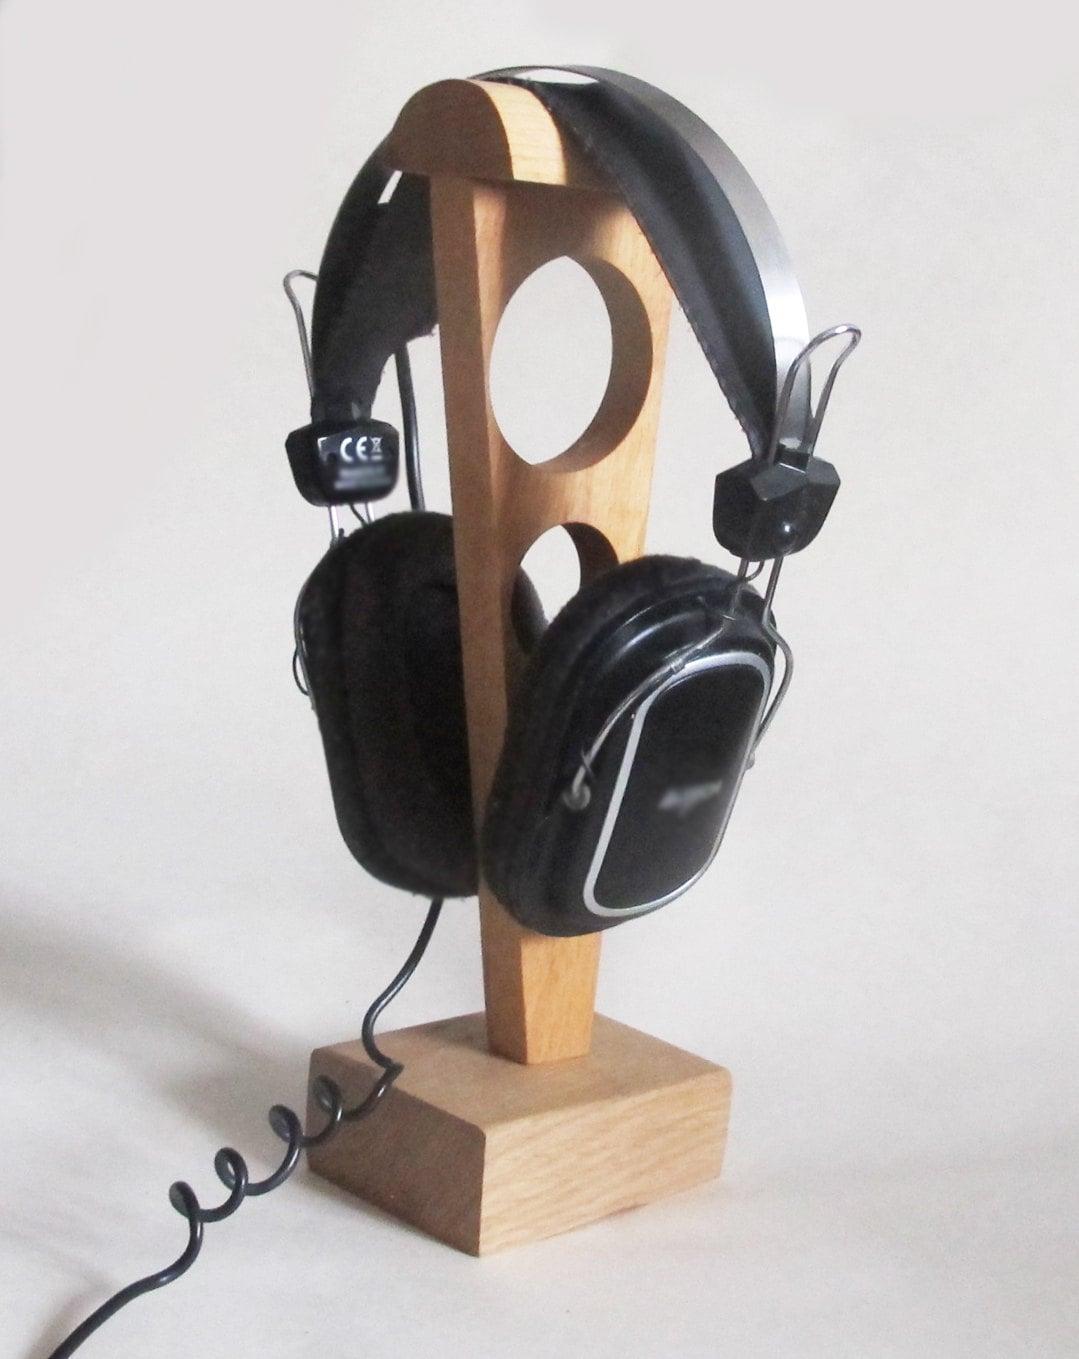 Wood headphone stand wooden headphone holder rustic wooden - Wooden headphone holder ...